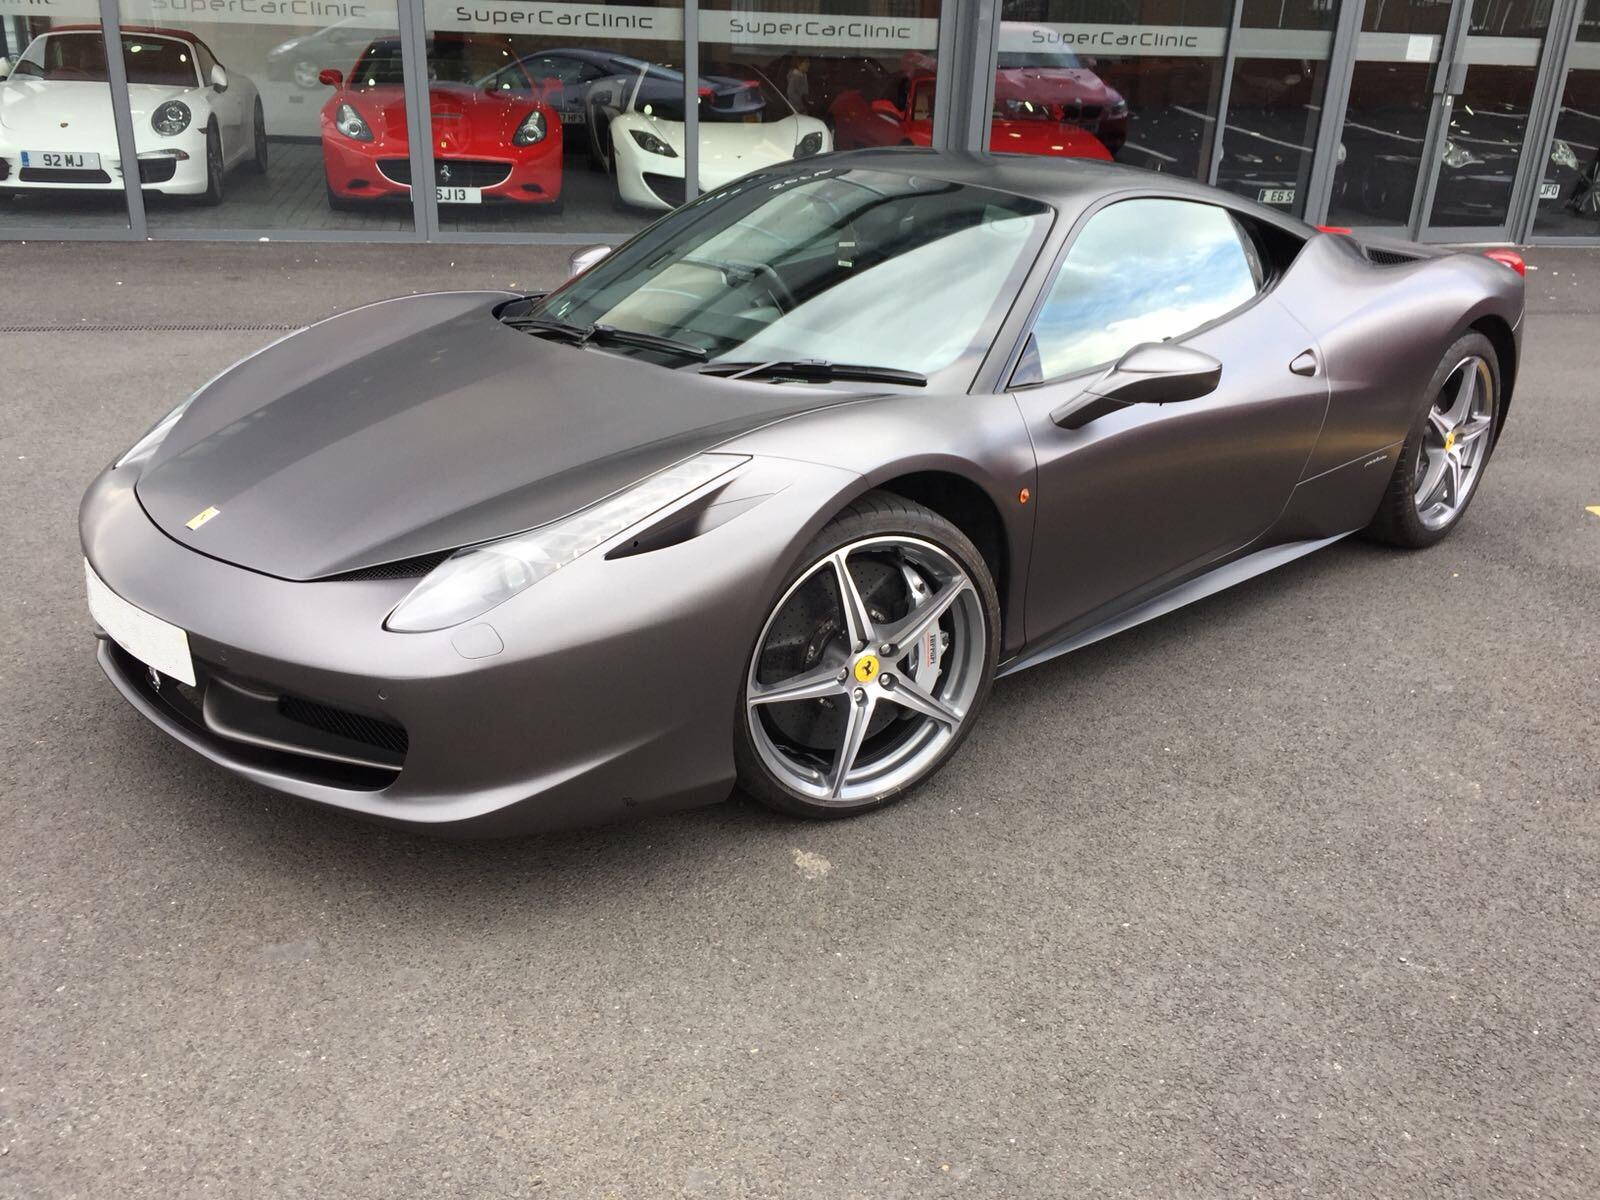 Ferrari 458 wrapped in Satin Matte Grey